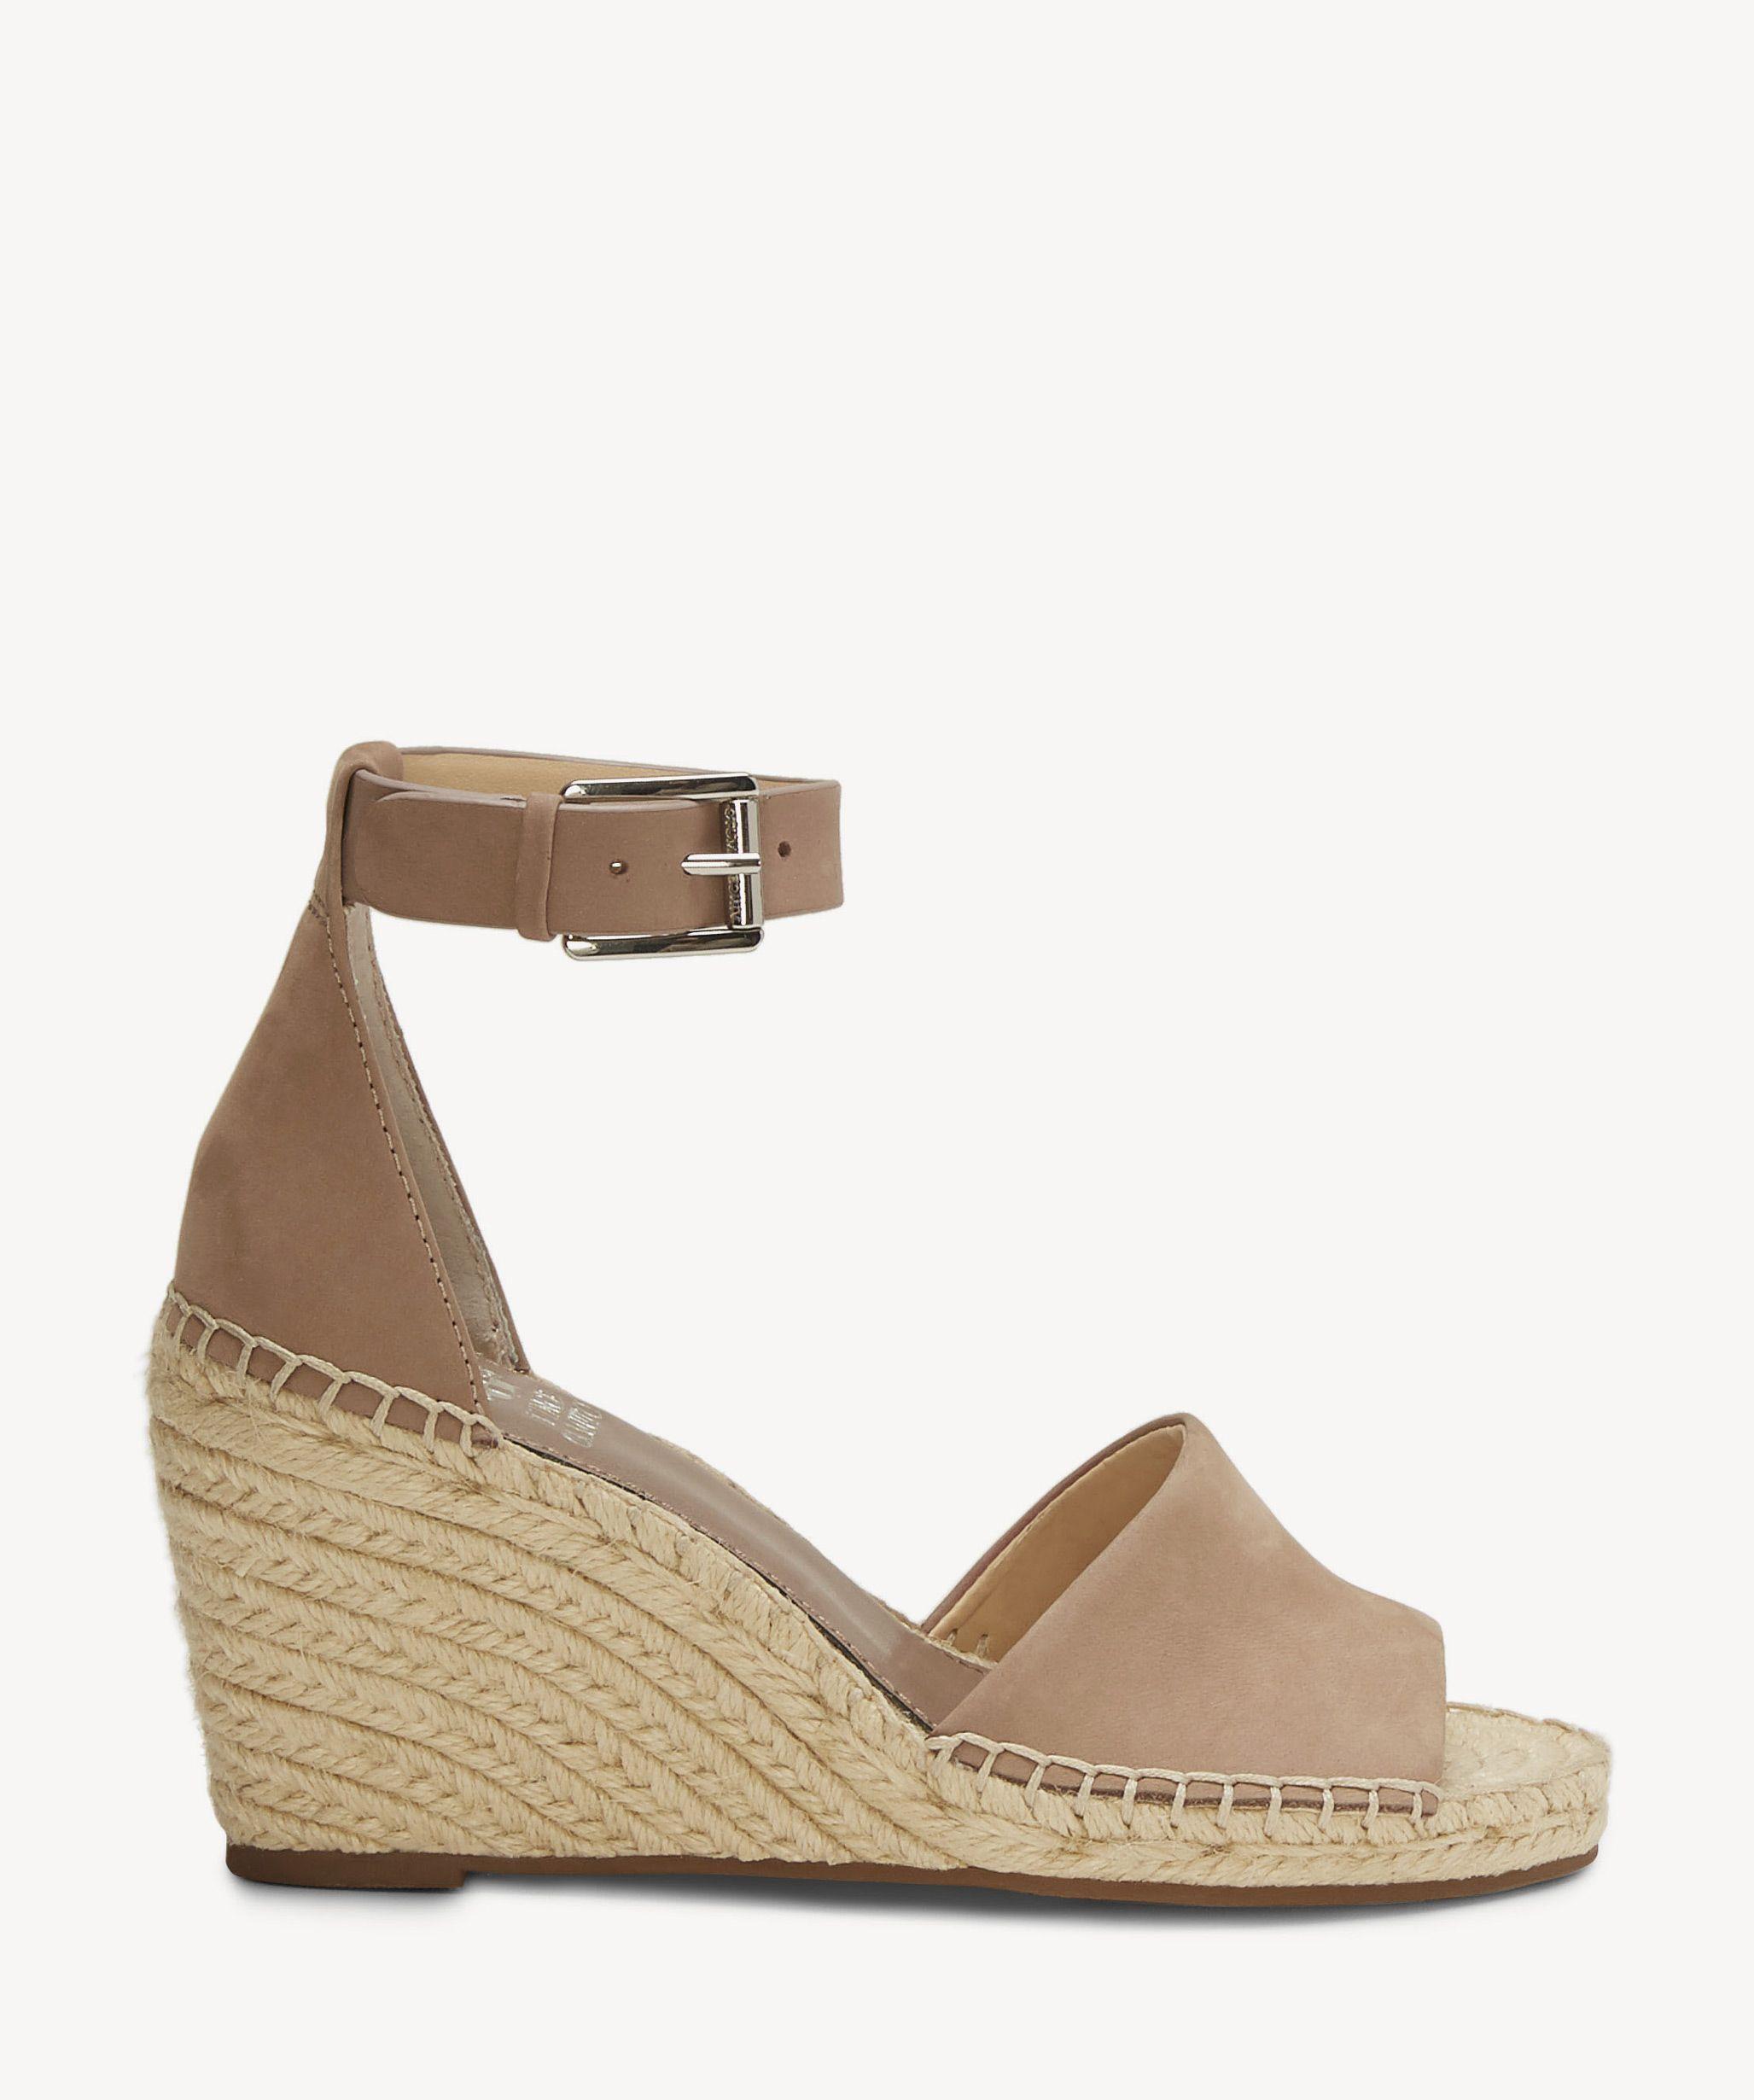 8b32ea5ffb3 Leera | Products | Espadrilles, Espadrille sandals, Sandals